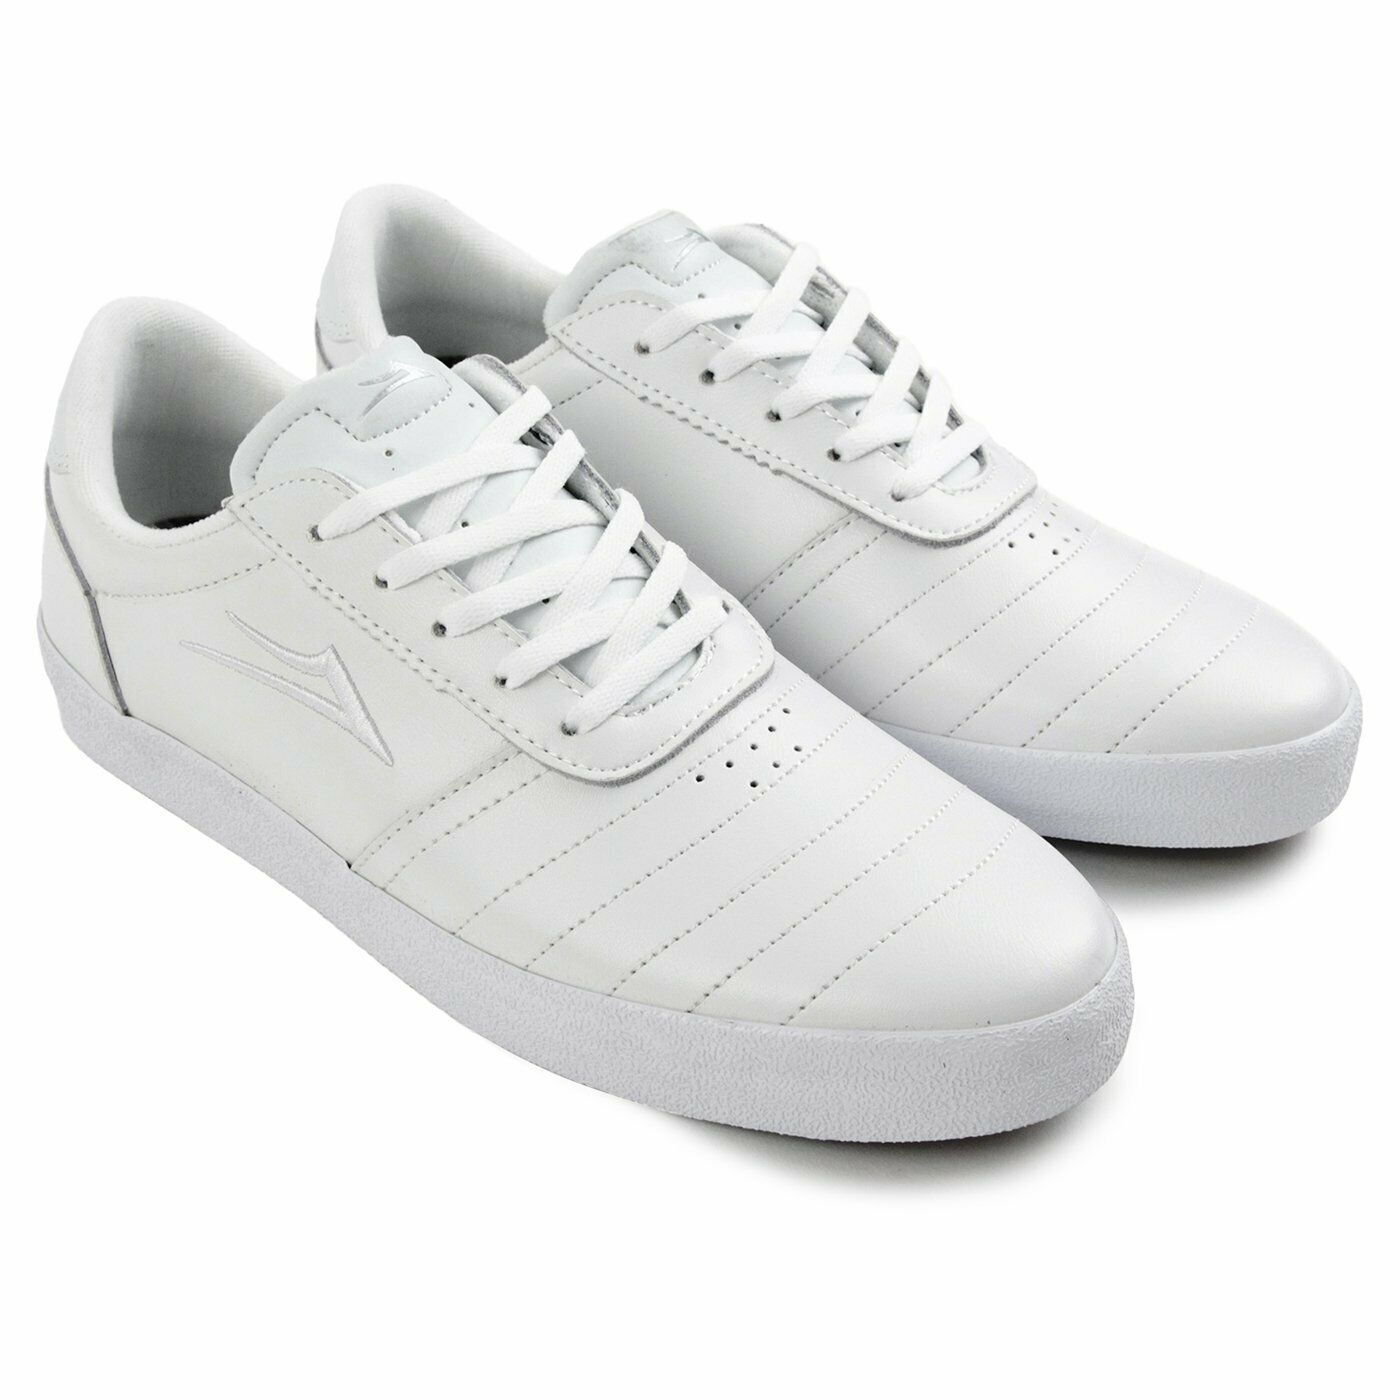 LAKAI ANCHOR SALFORD Men's Shoes - White Leather - Size 8 - NIB